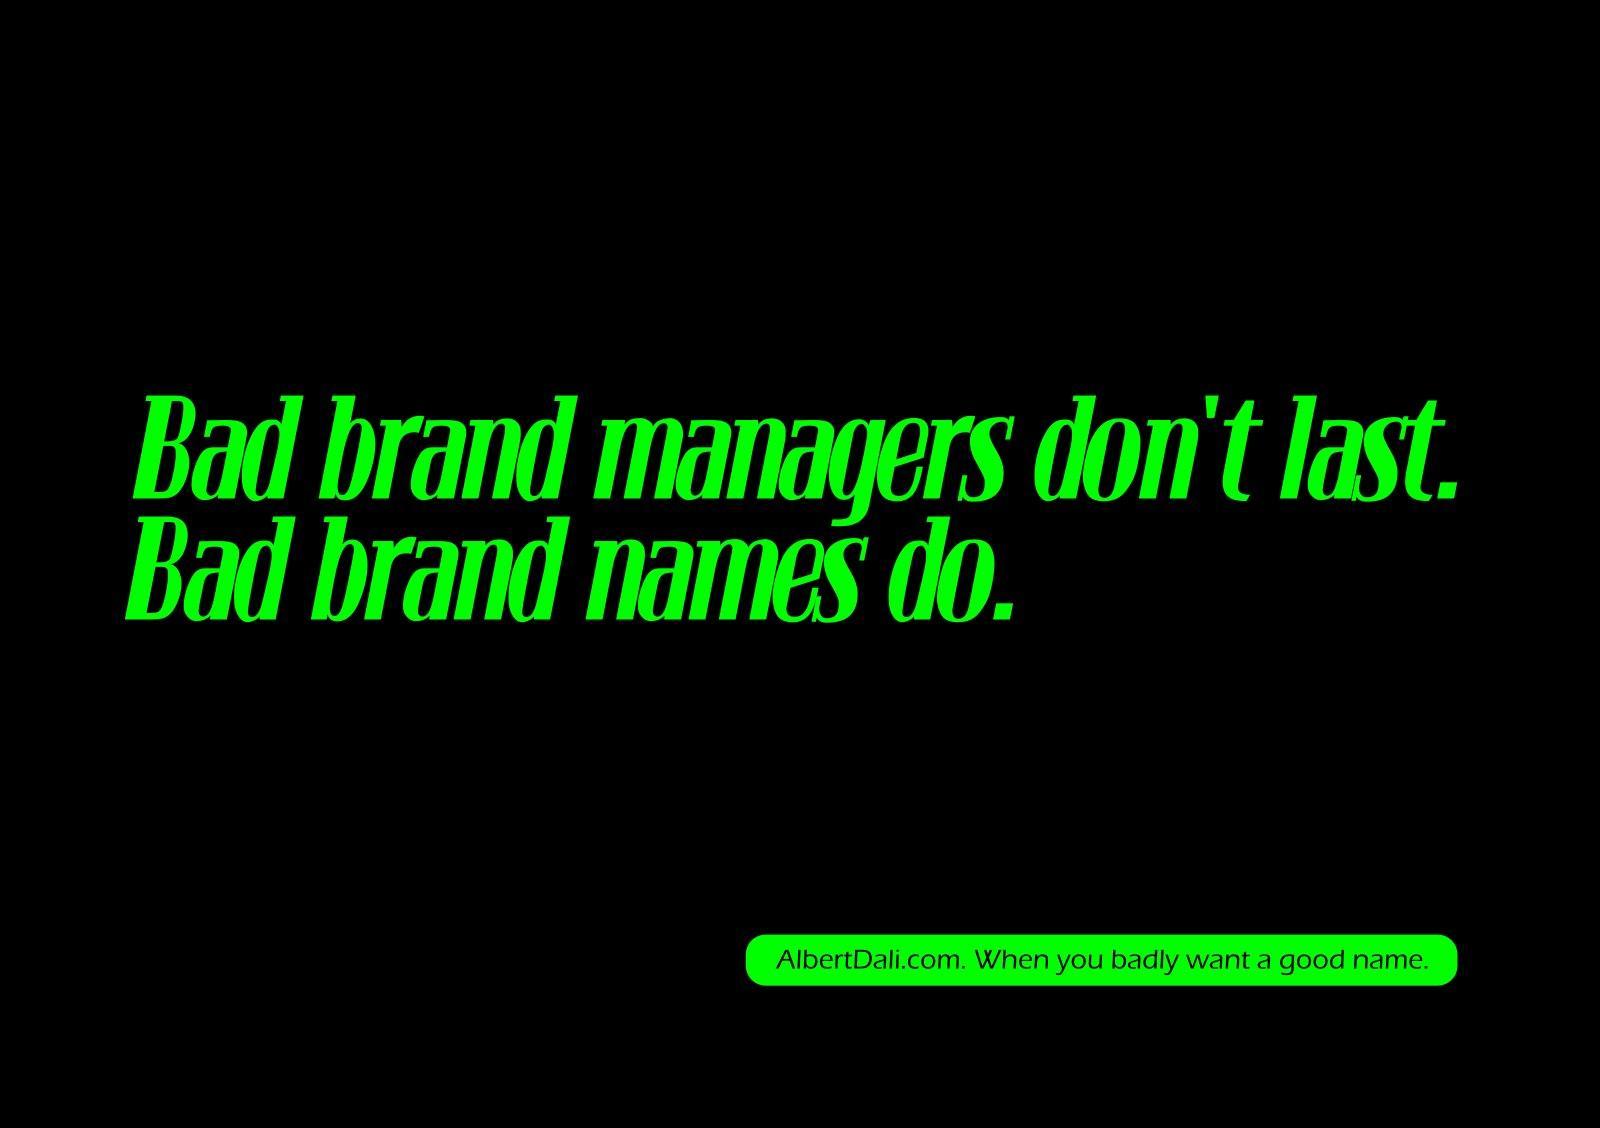 Albert Dali Print Ad -  Bad brand managers